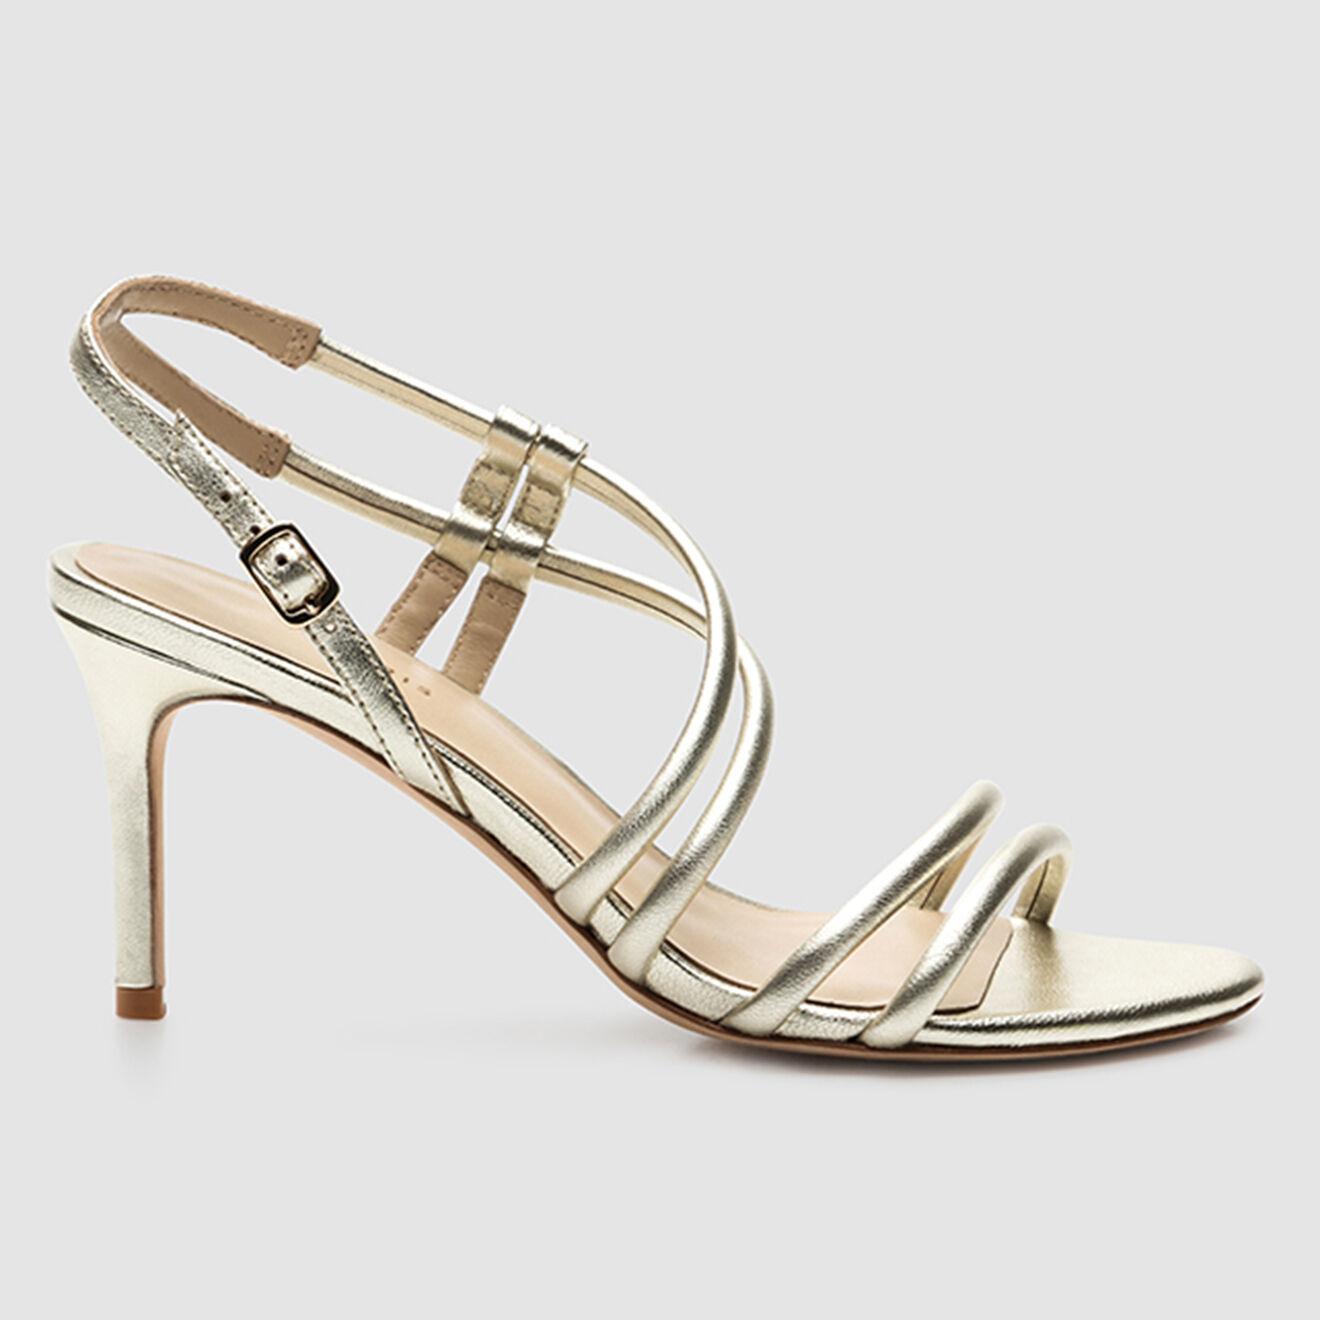 Sandales en Cuir Douli - Talon 7 cm - Cosmoparis - Modalova